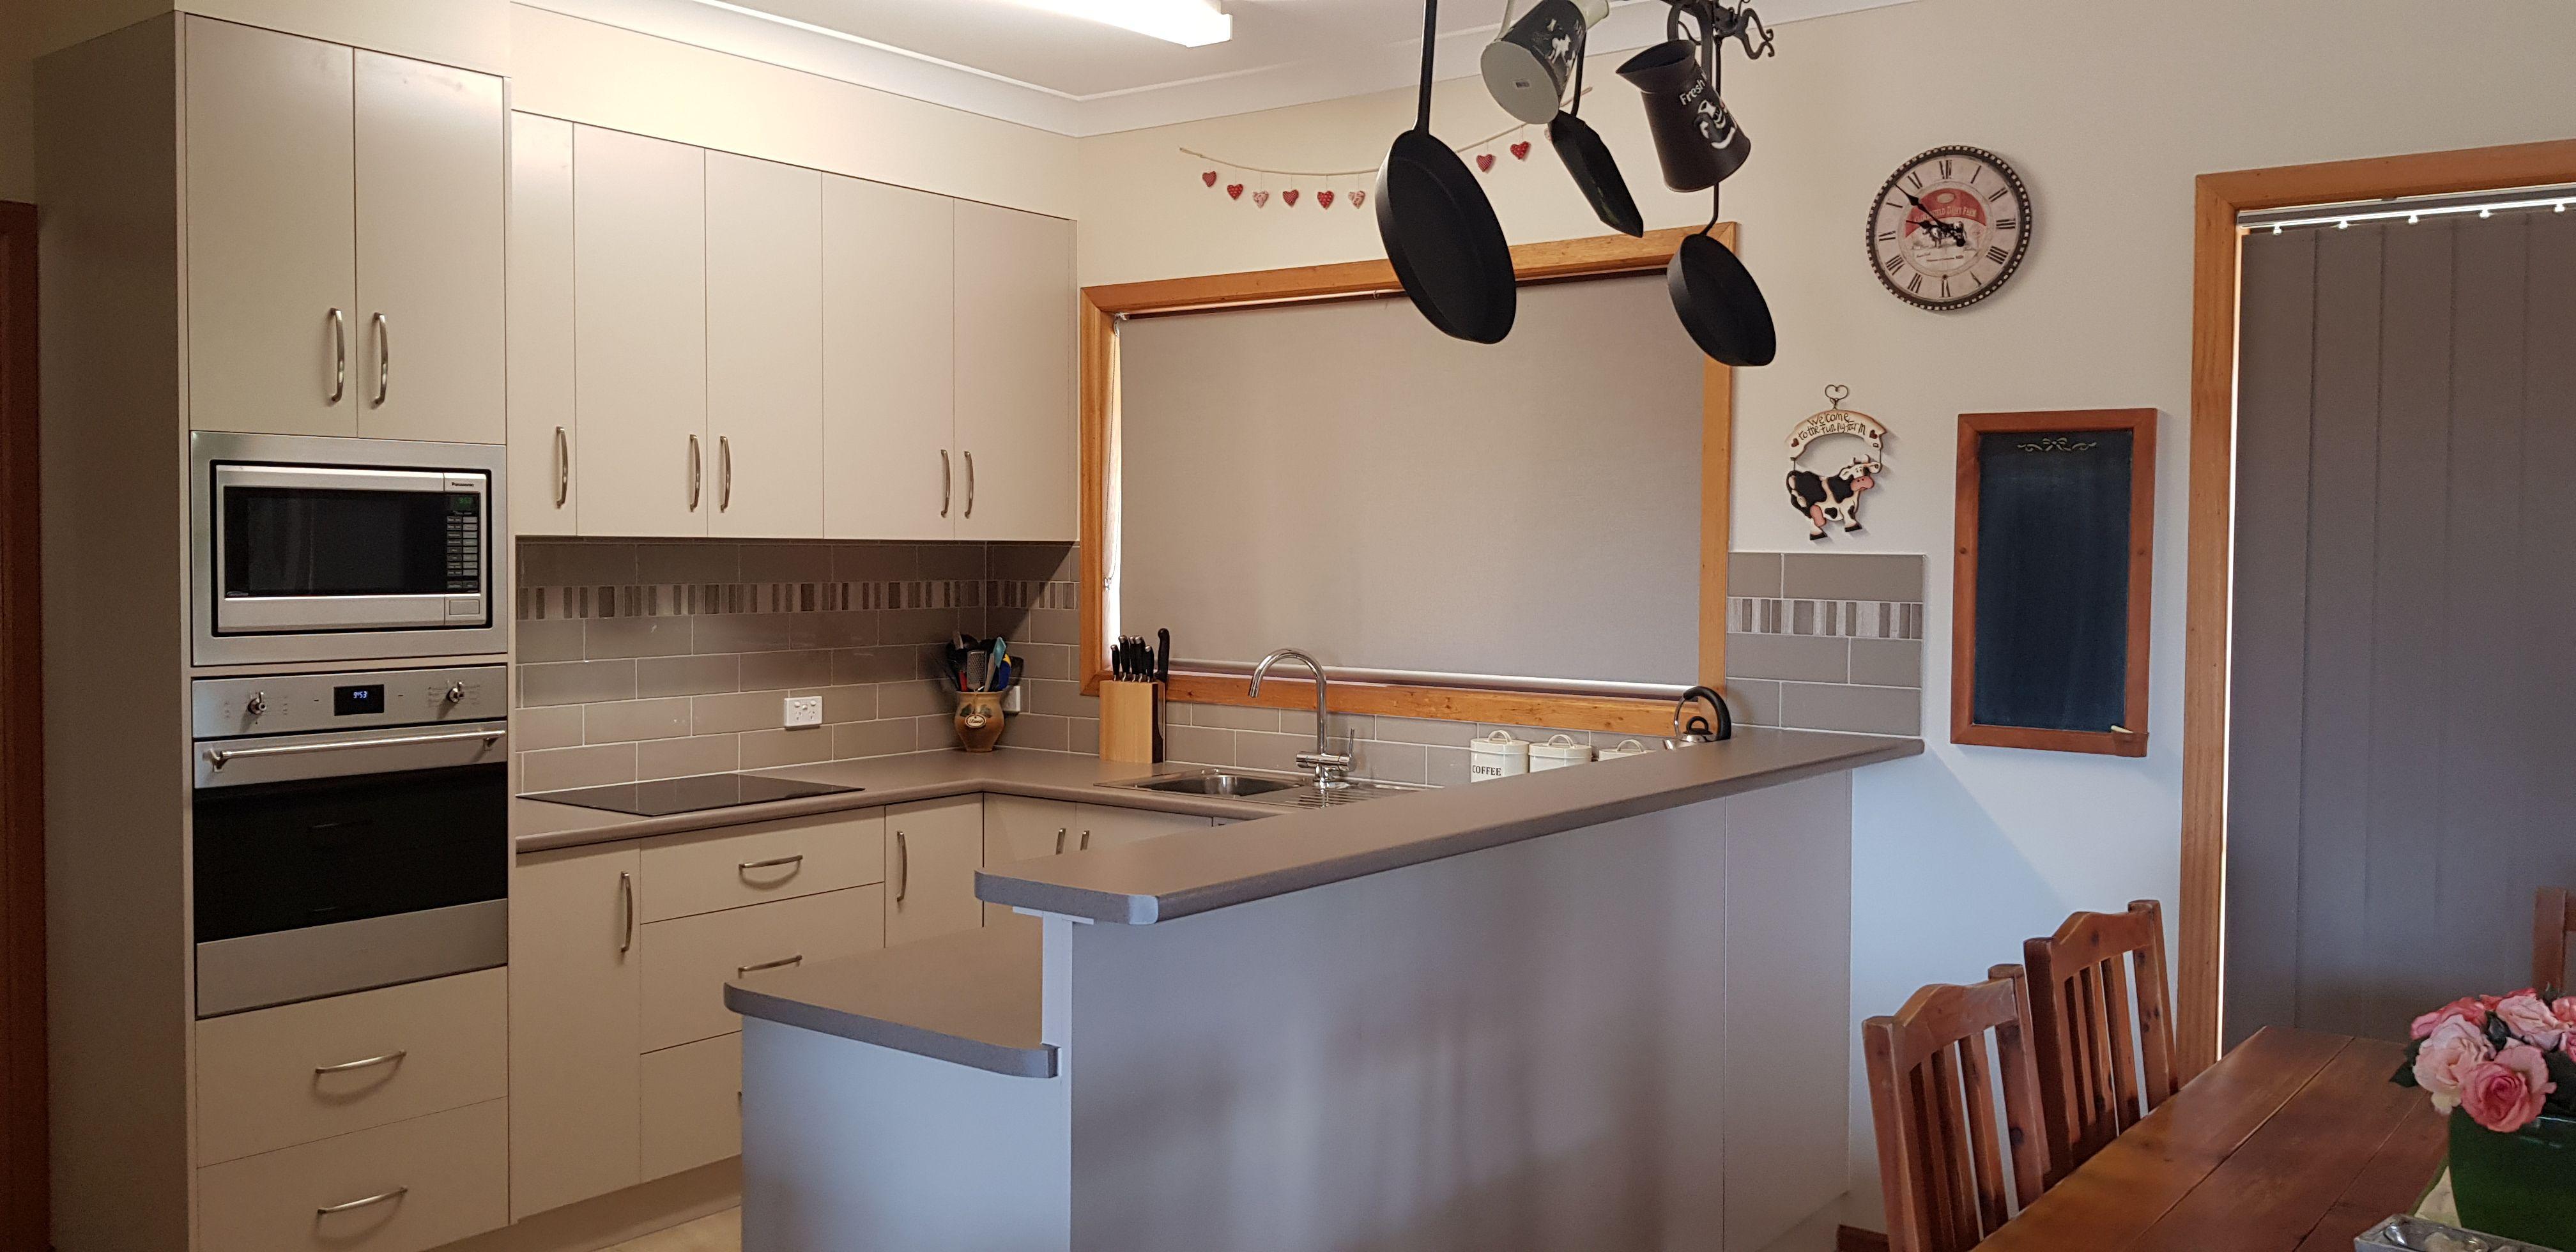 Malt And Mocha Kitchen Breakfast Bar Kitchen Breakfast Bar Breakfast Bar Kitchen